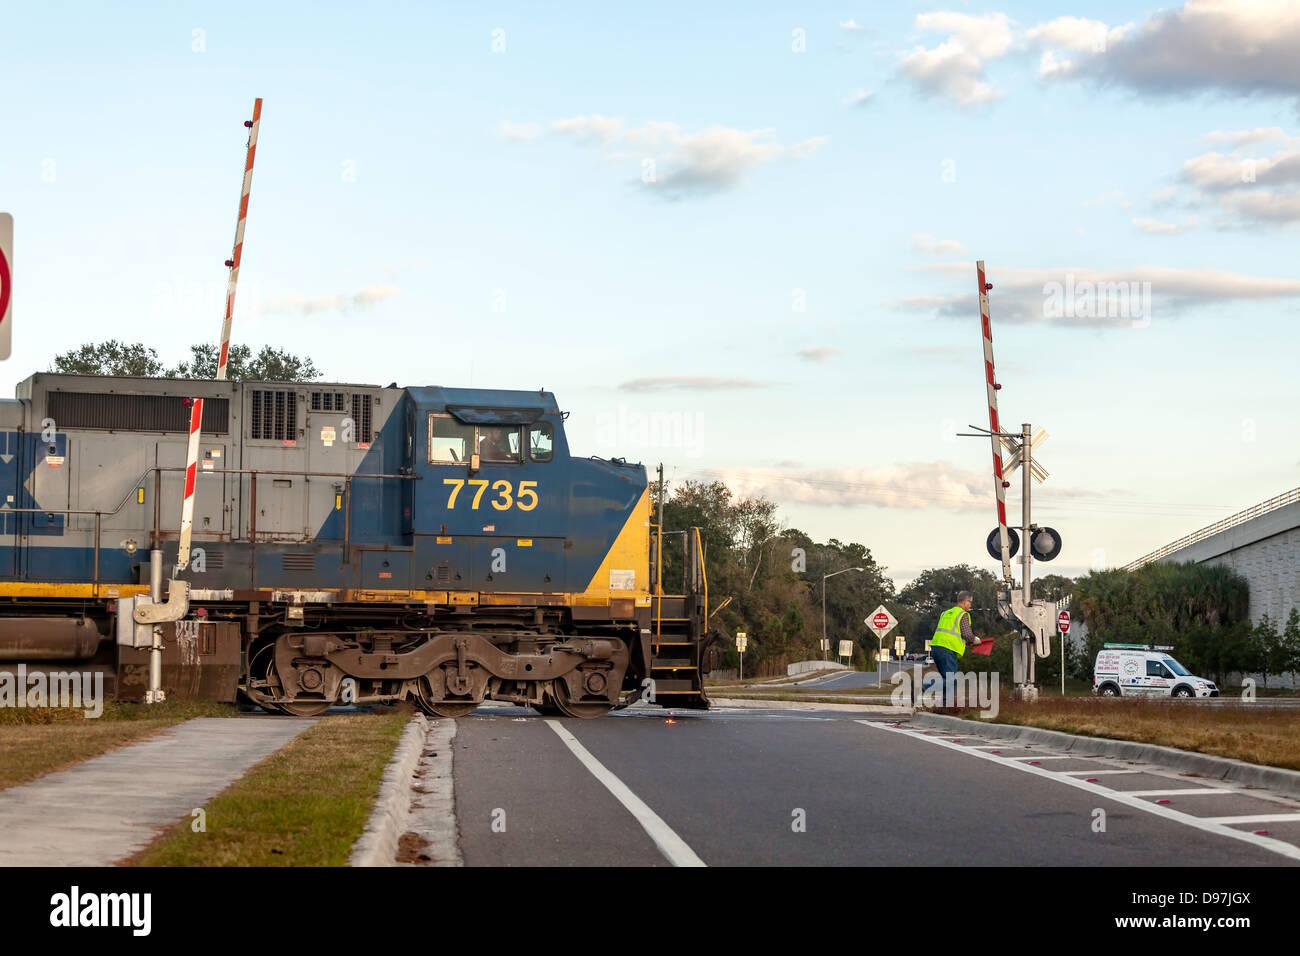 CSX engine 7735 slowly pulls a freight train through a